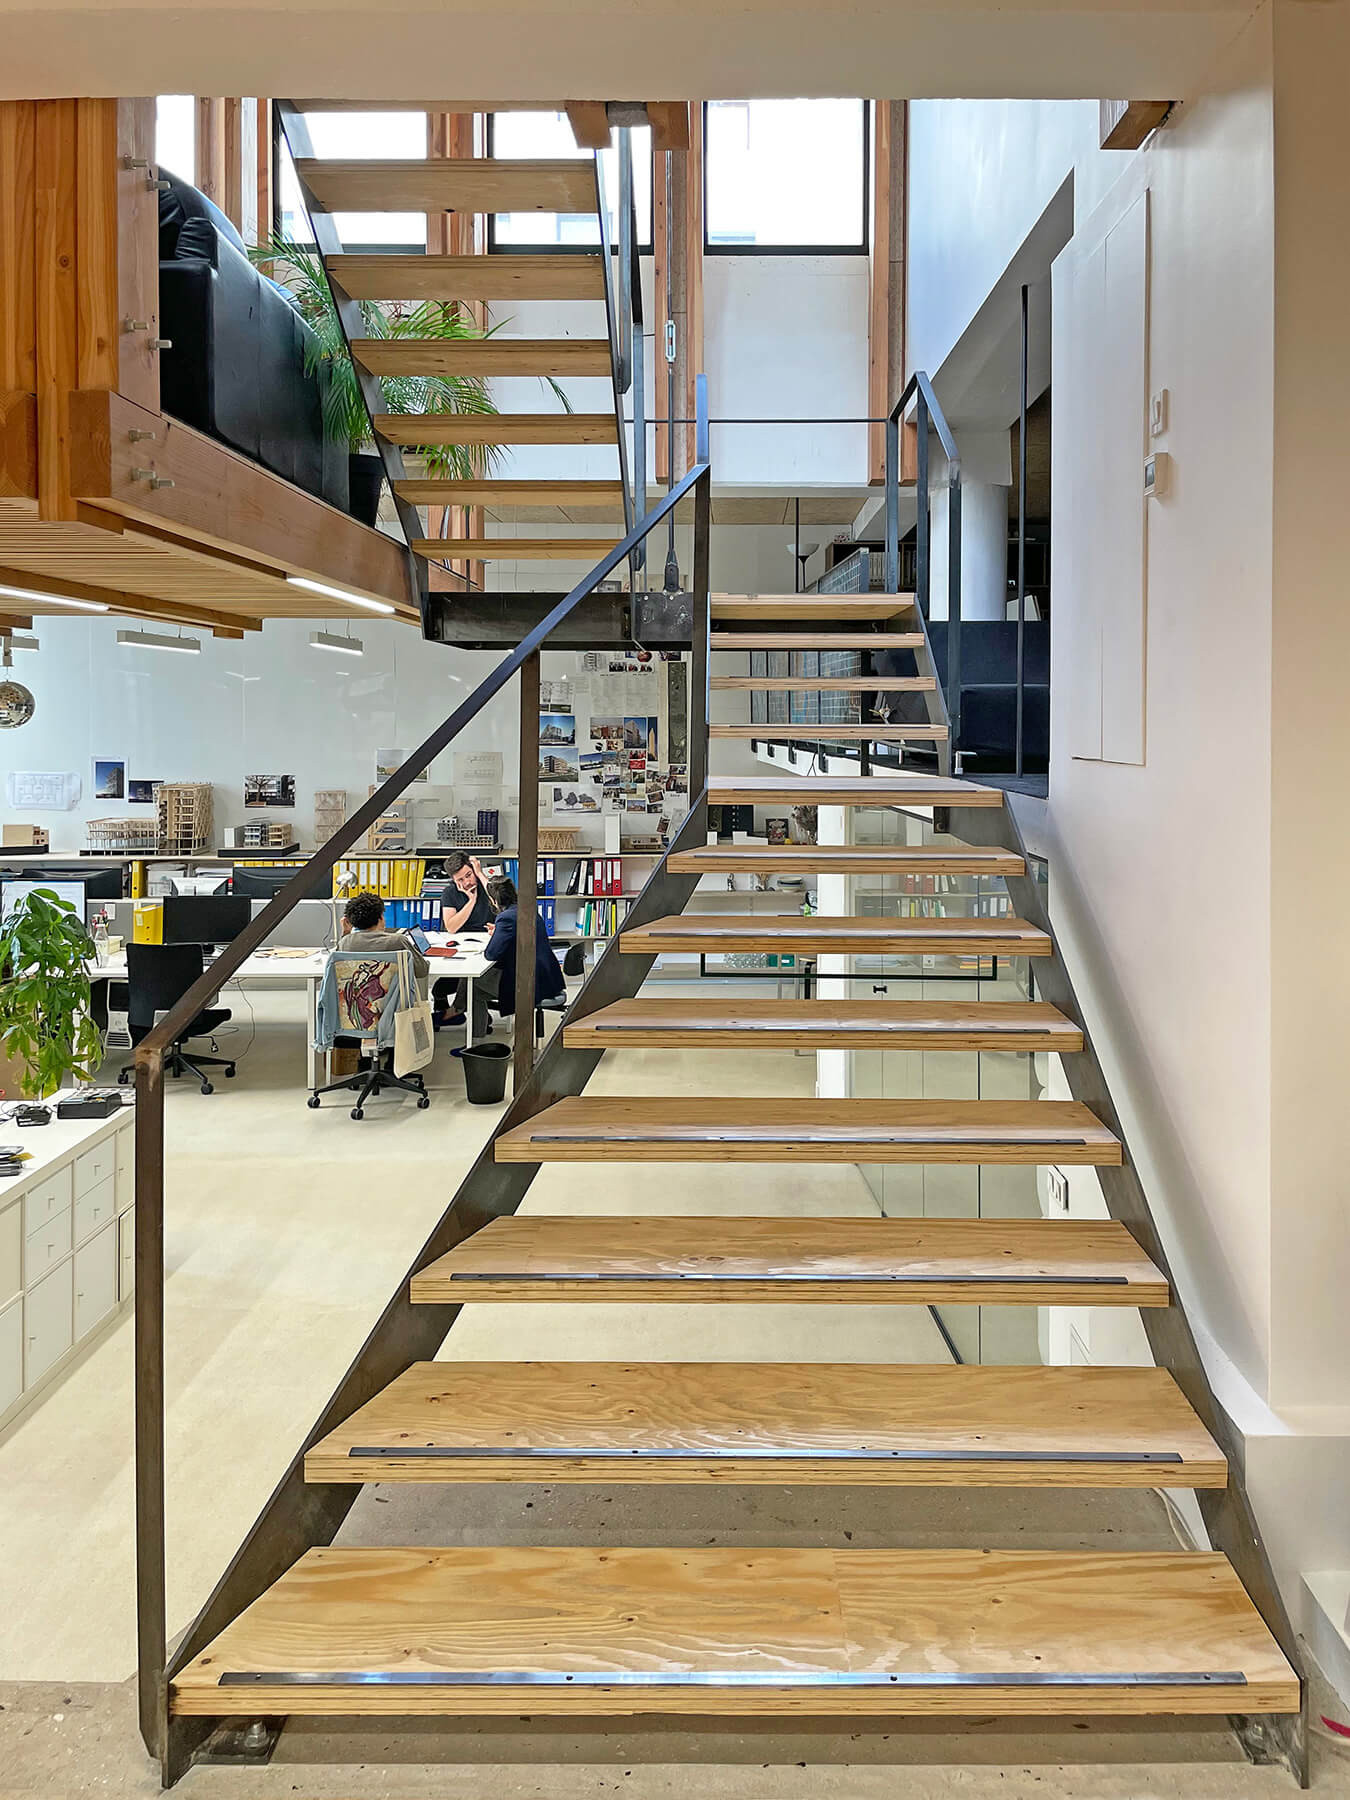 graam-escalier-agence-vue-globale